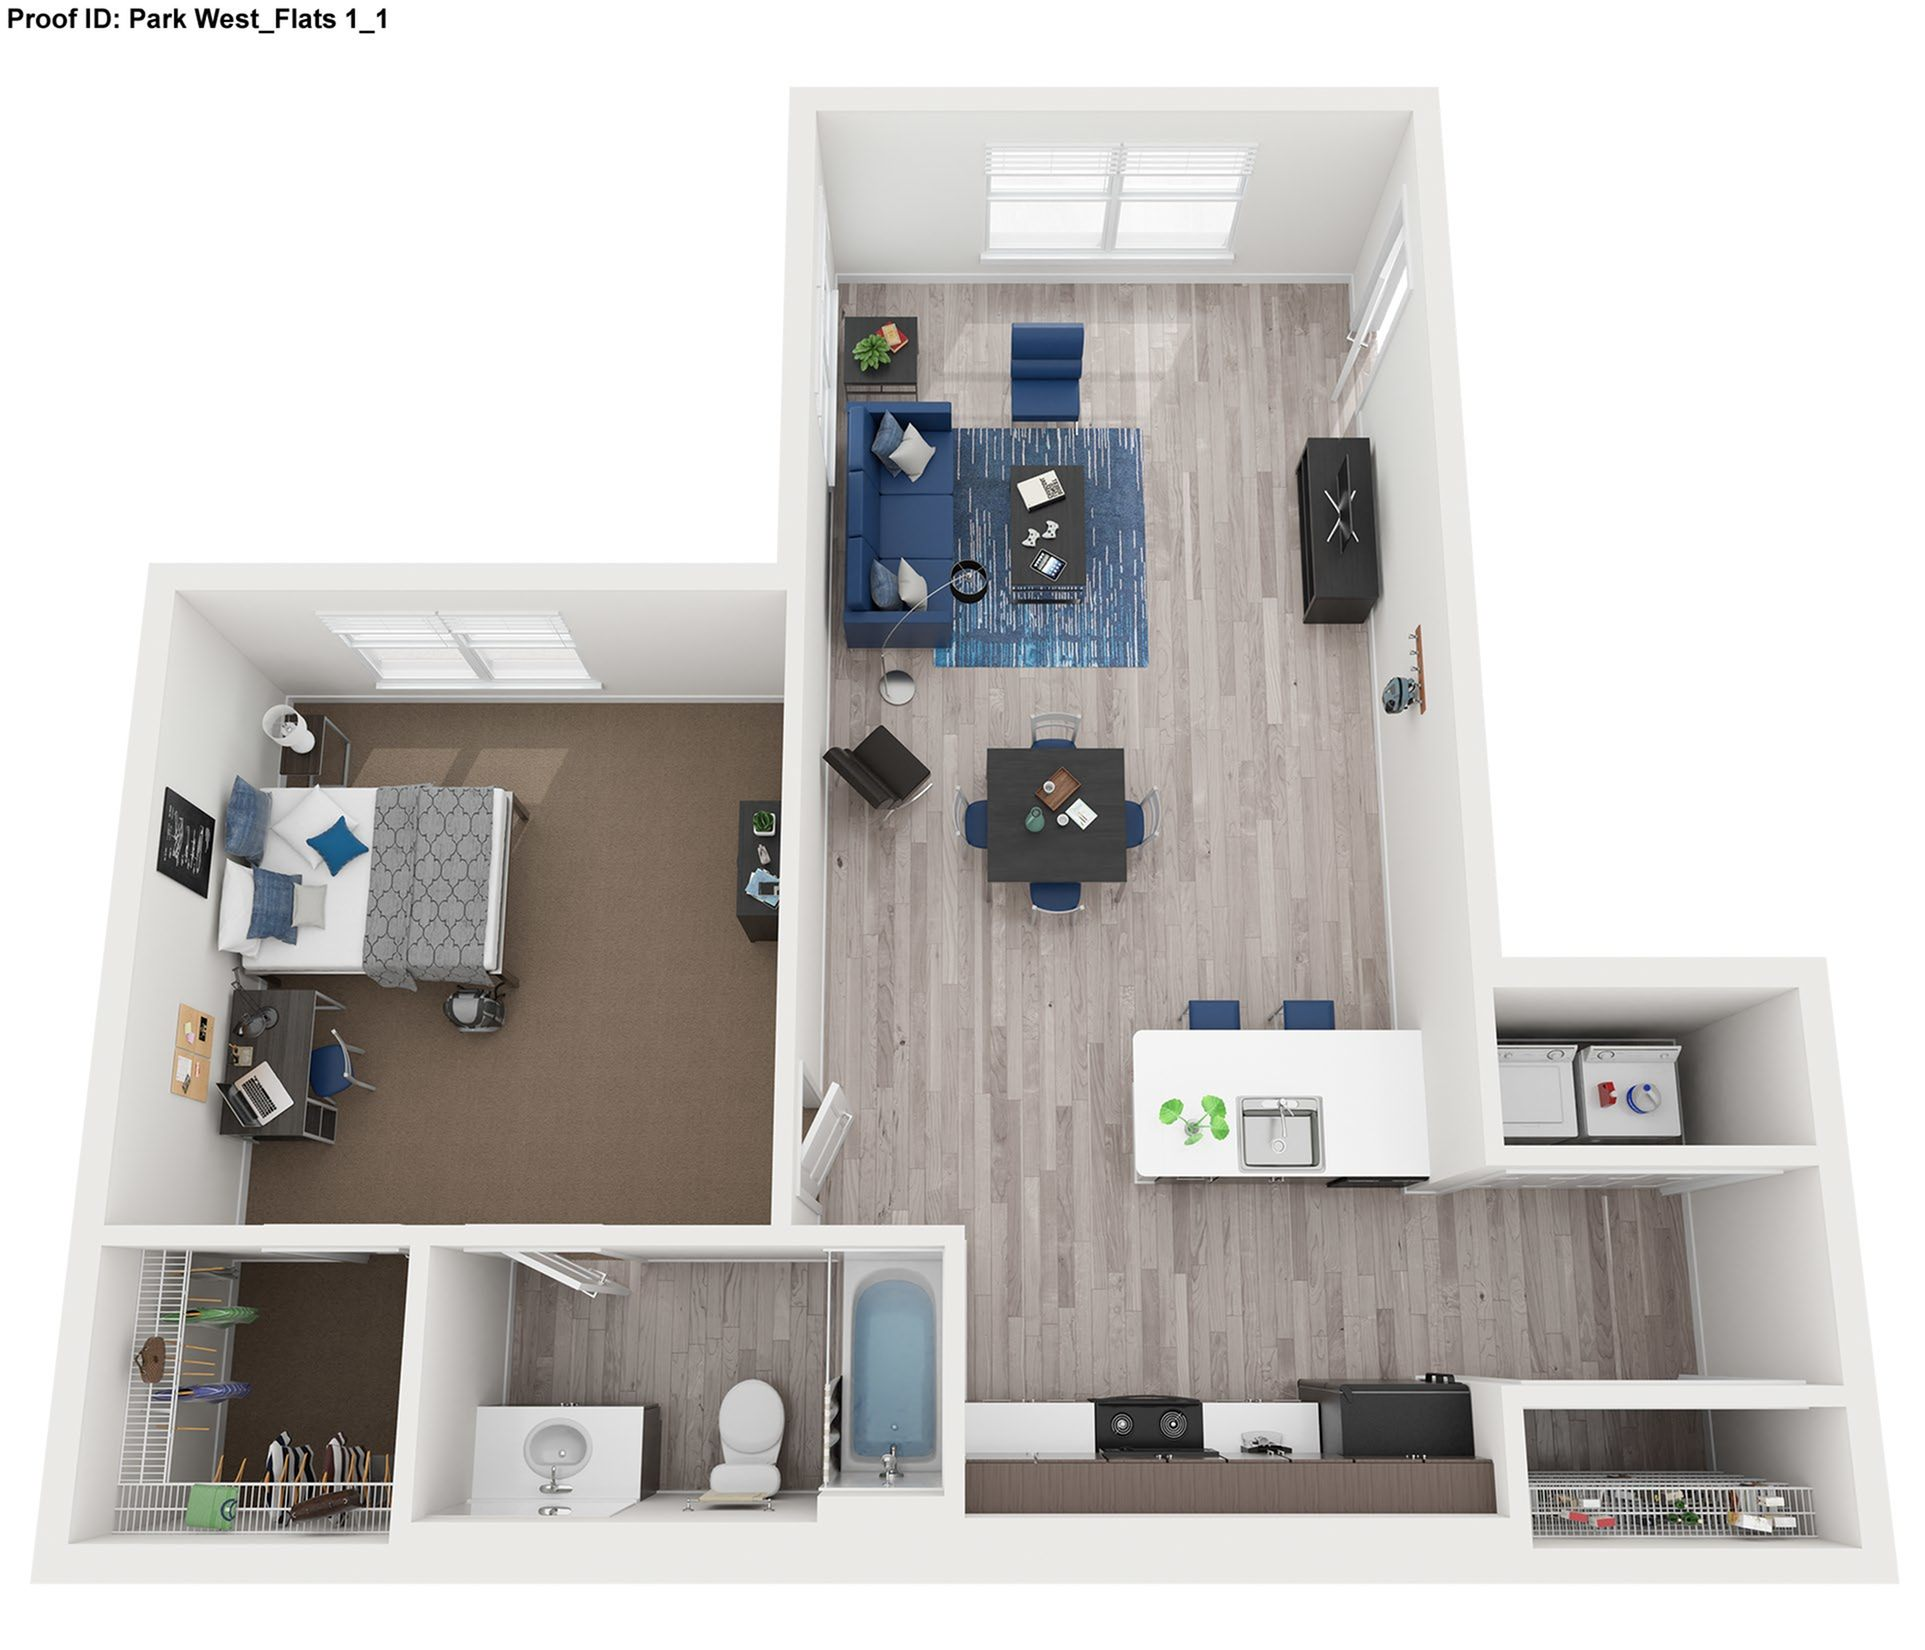 1 Bdrm Floor Plan  |  Park West  | Apartments In College Station, Texas